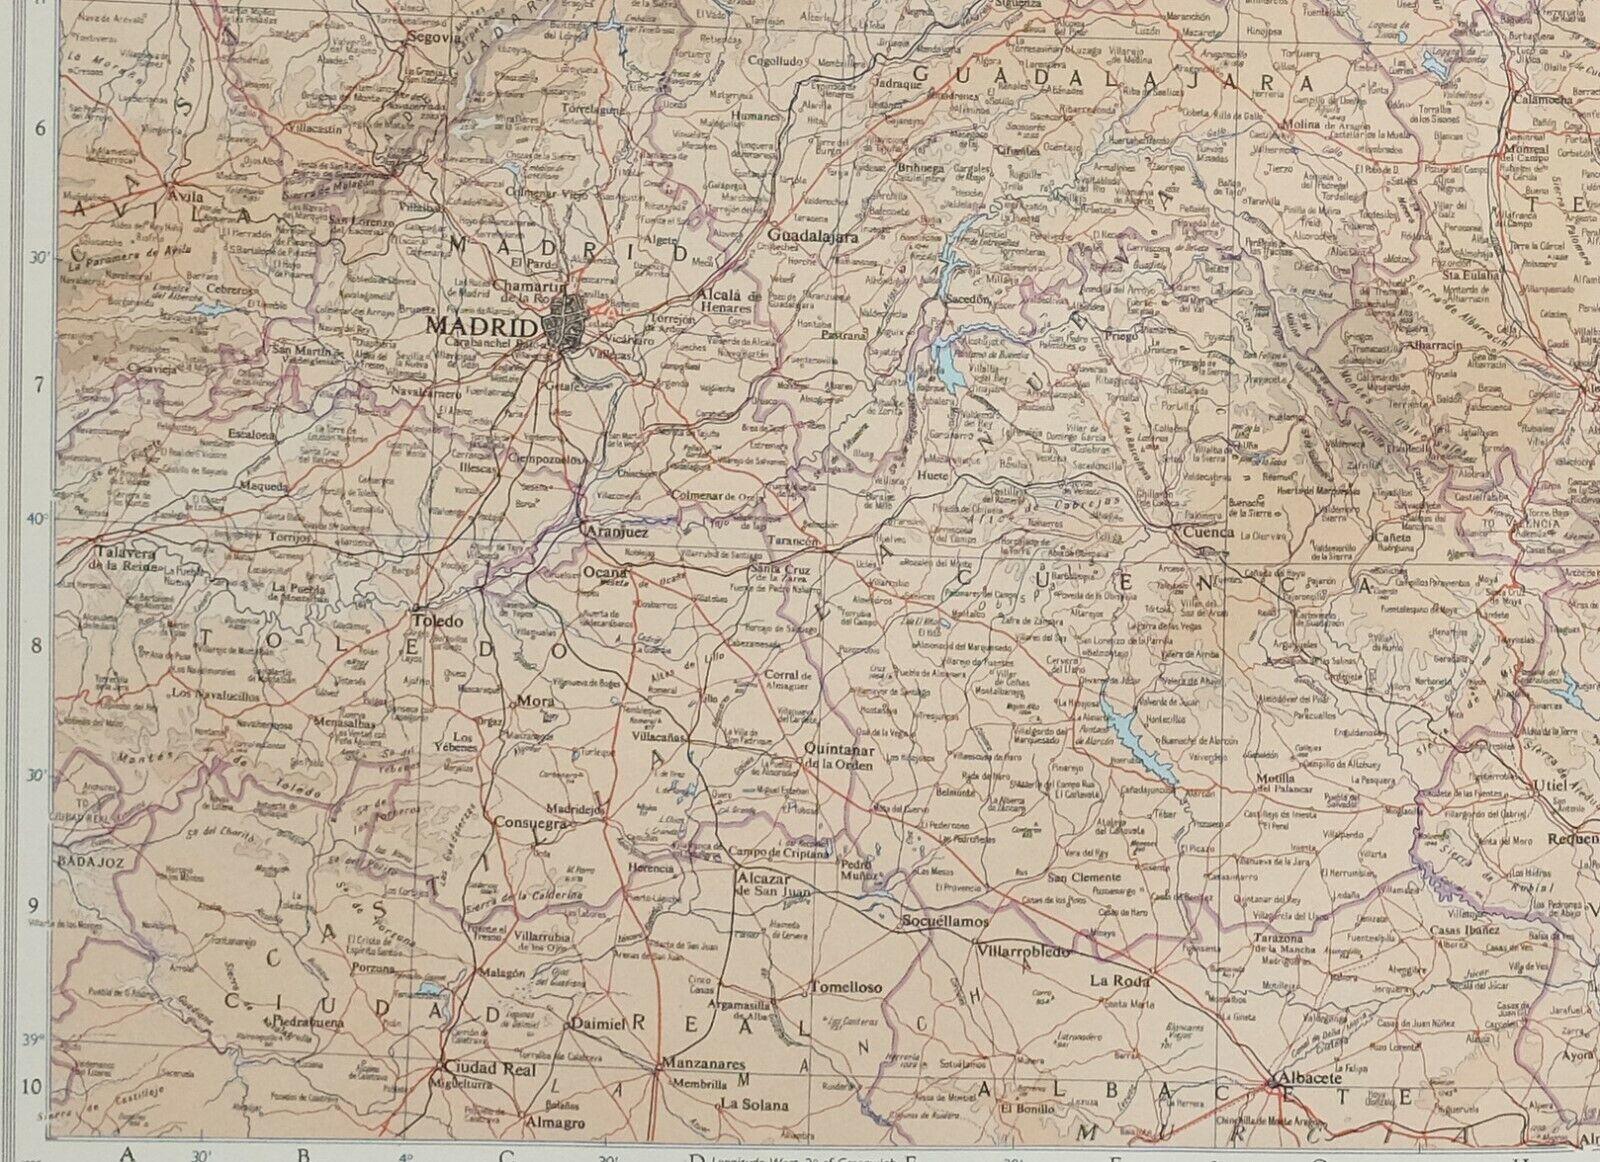 1956 LARGE MAP SPAIN NORTH EAST ~ MADRID ENVIRONS VALENCIA CASTELLON TARRAGONA